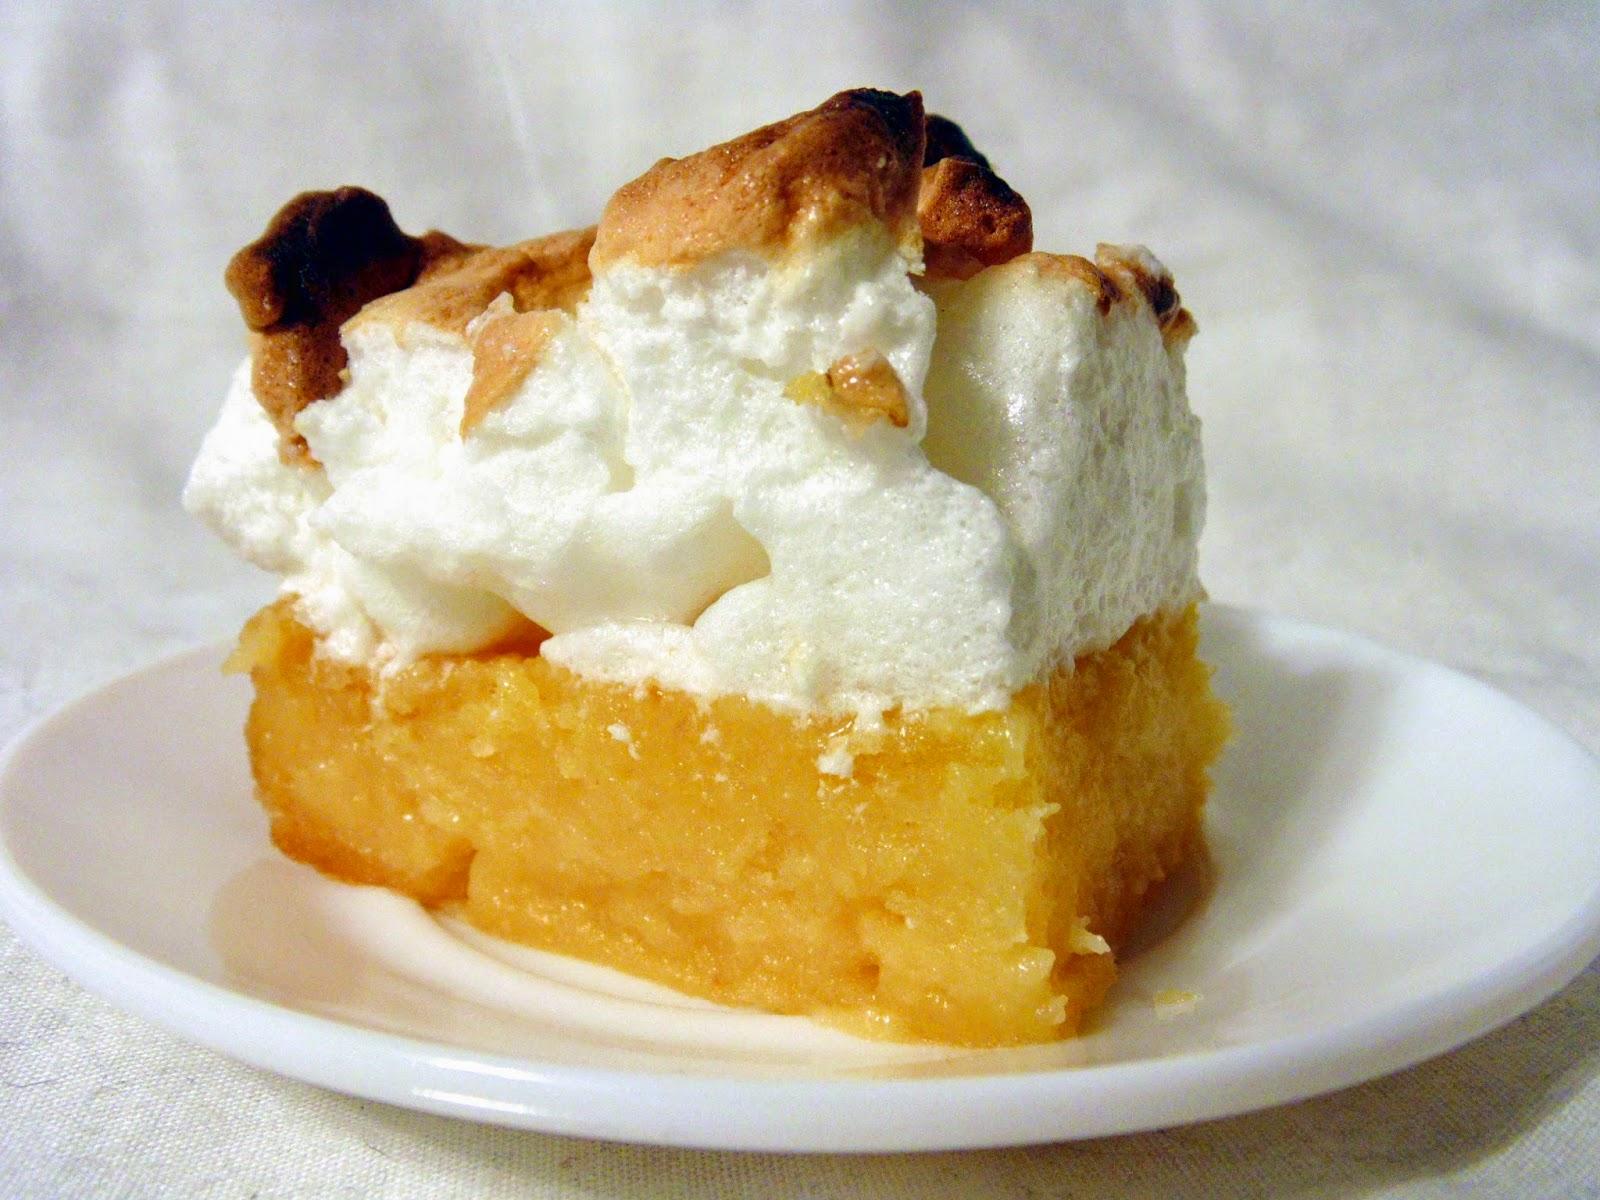 gateau gaga love cakes tarte au citron sans p te. Black Bedroom Furniture Sets. Home Design Ideas